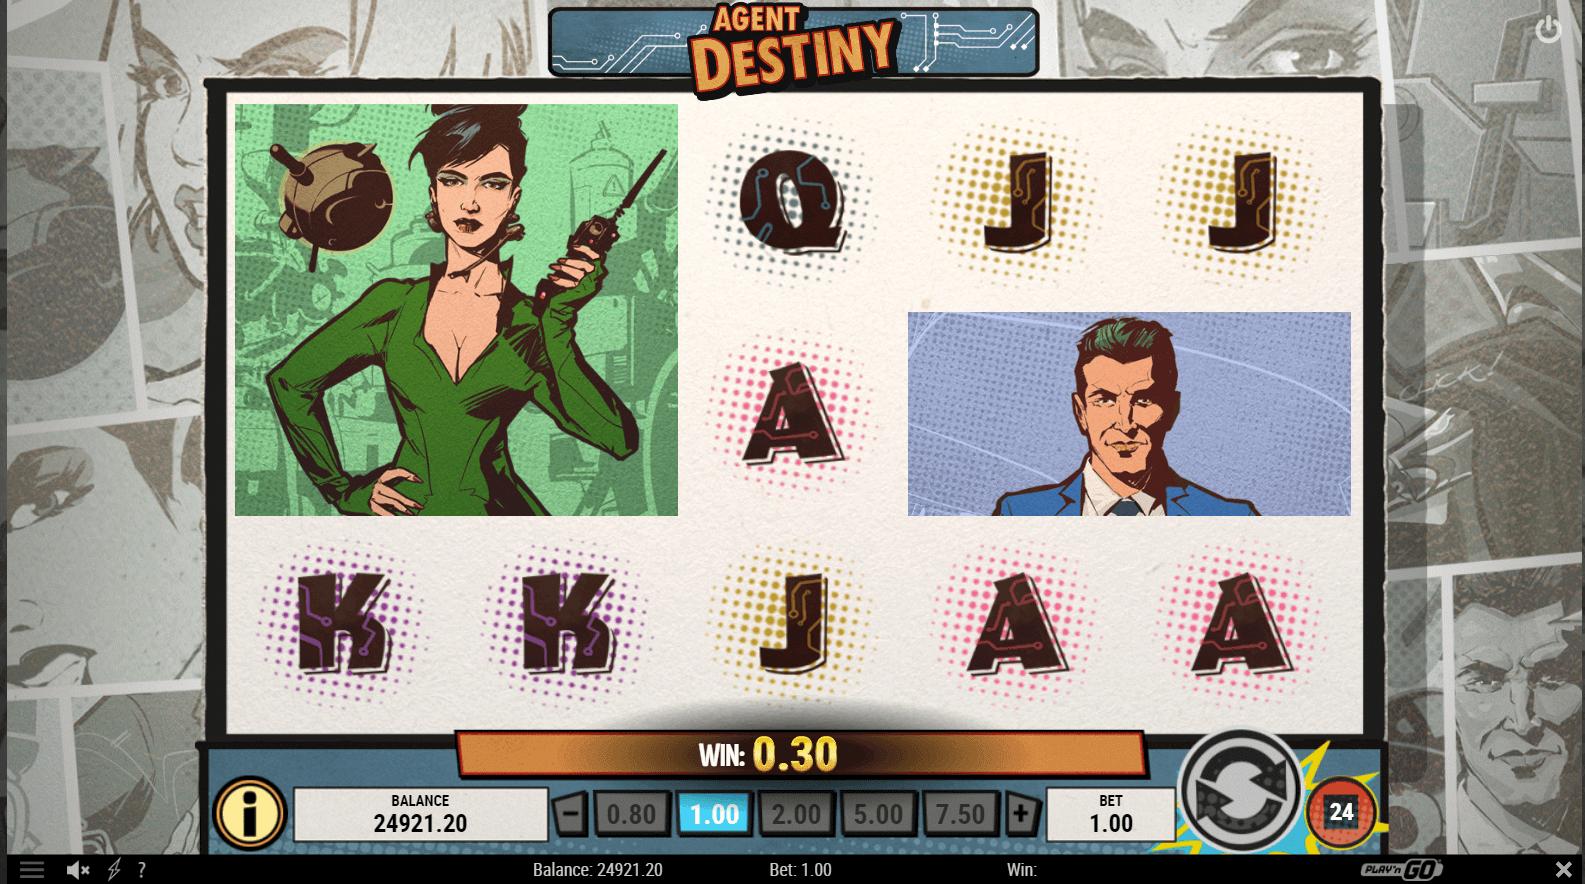 Agent Destiny Slot Game